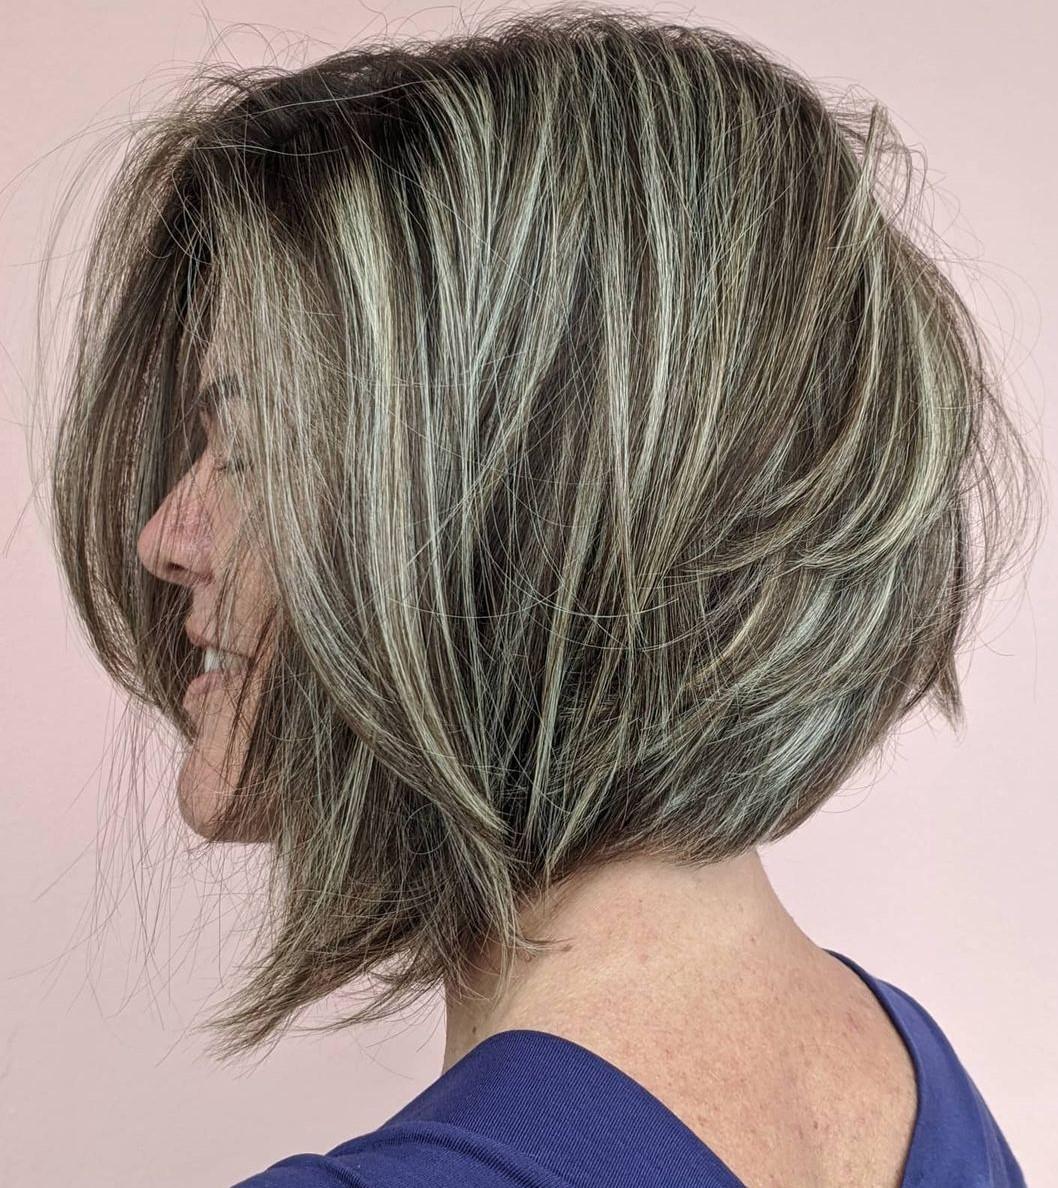 Foil Blonde Highlights for Brown Hair